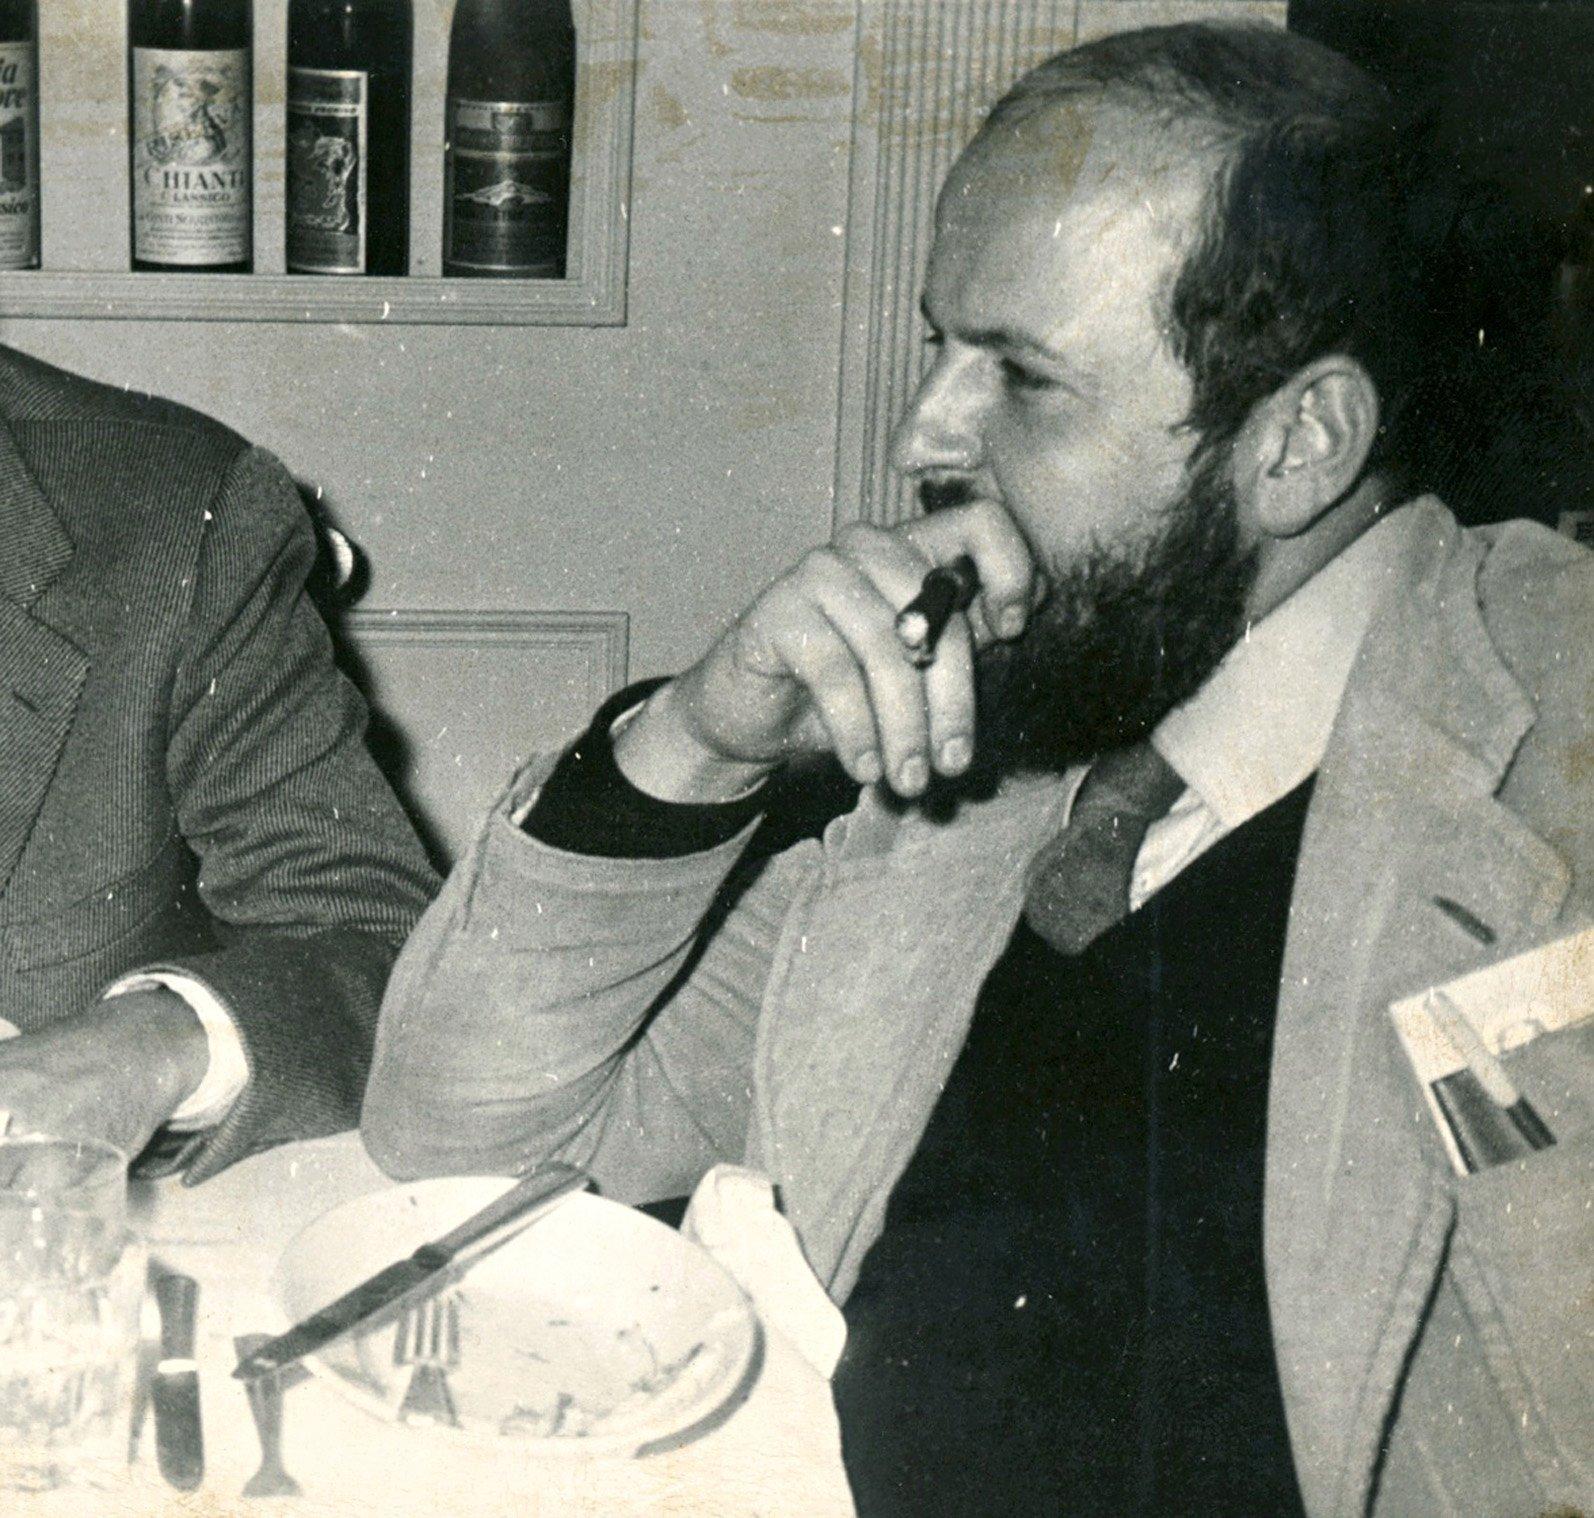 Riccardo Francovich, Firenze, 1973.